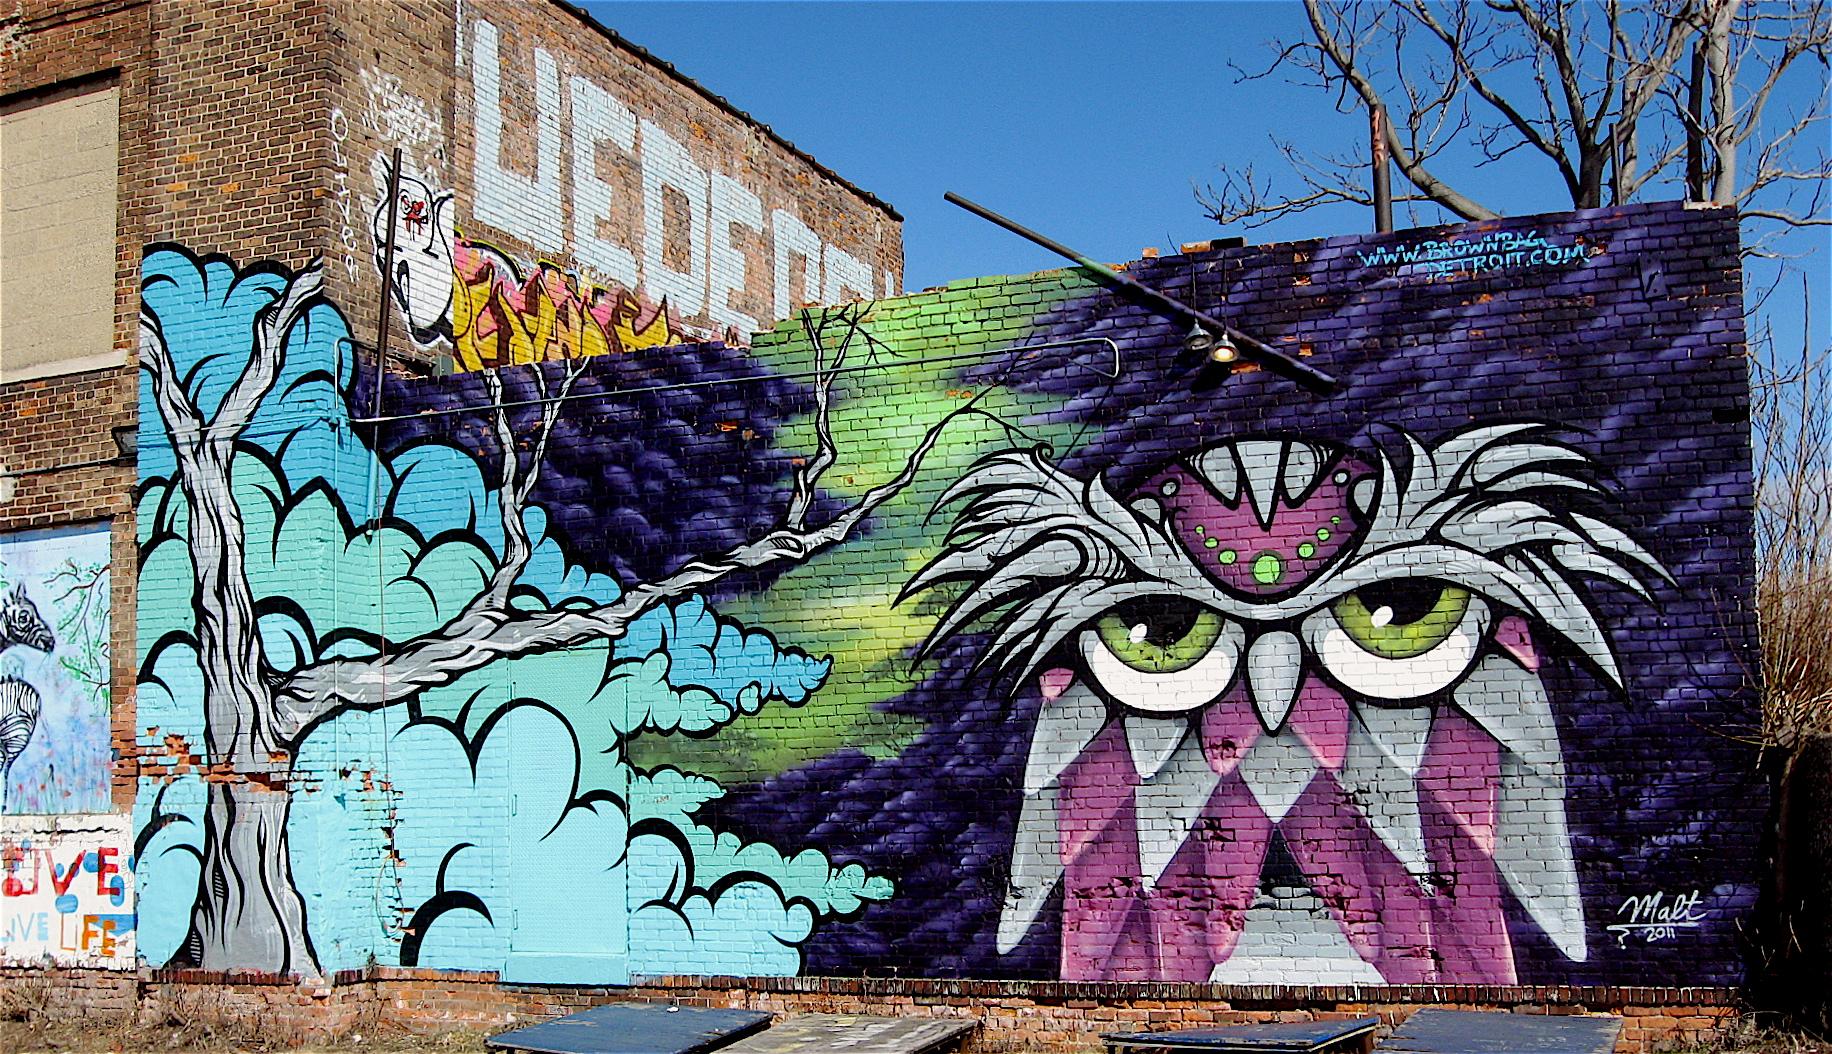 malt-owl-and-acid-forest_5471.jpg